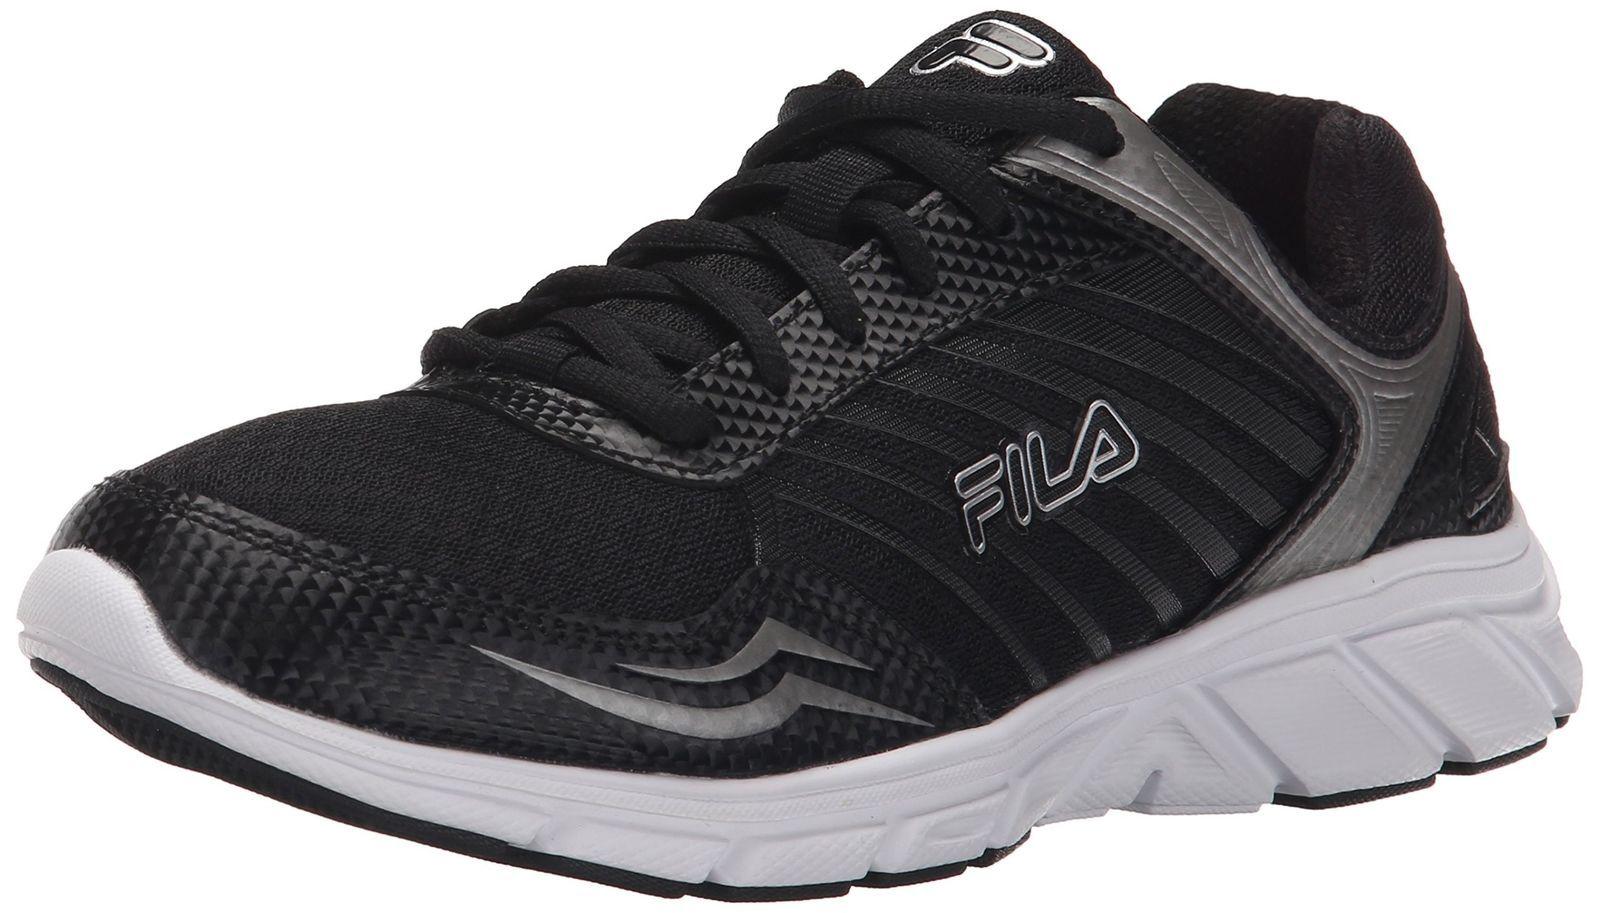 145 Review And Listings Shoes1 Customer Fila pMVSUz